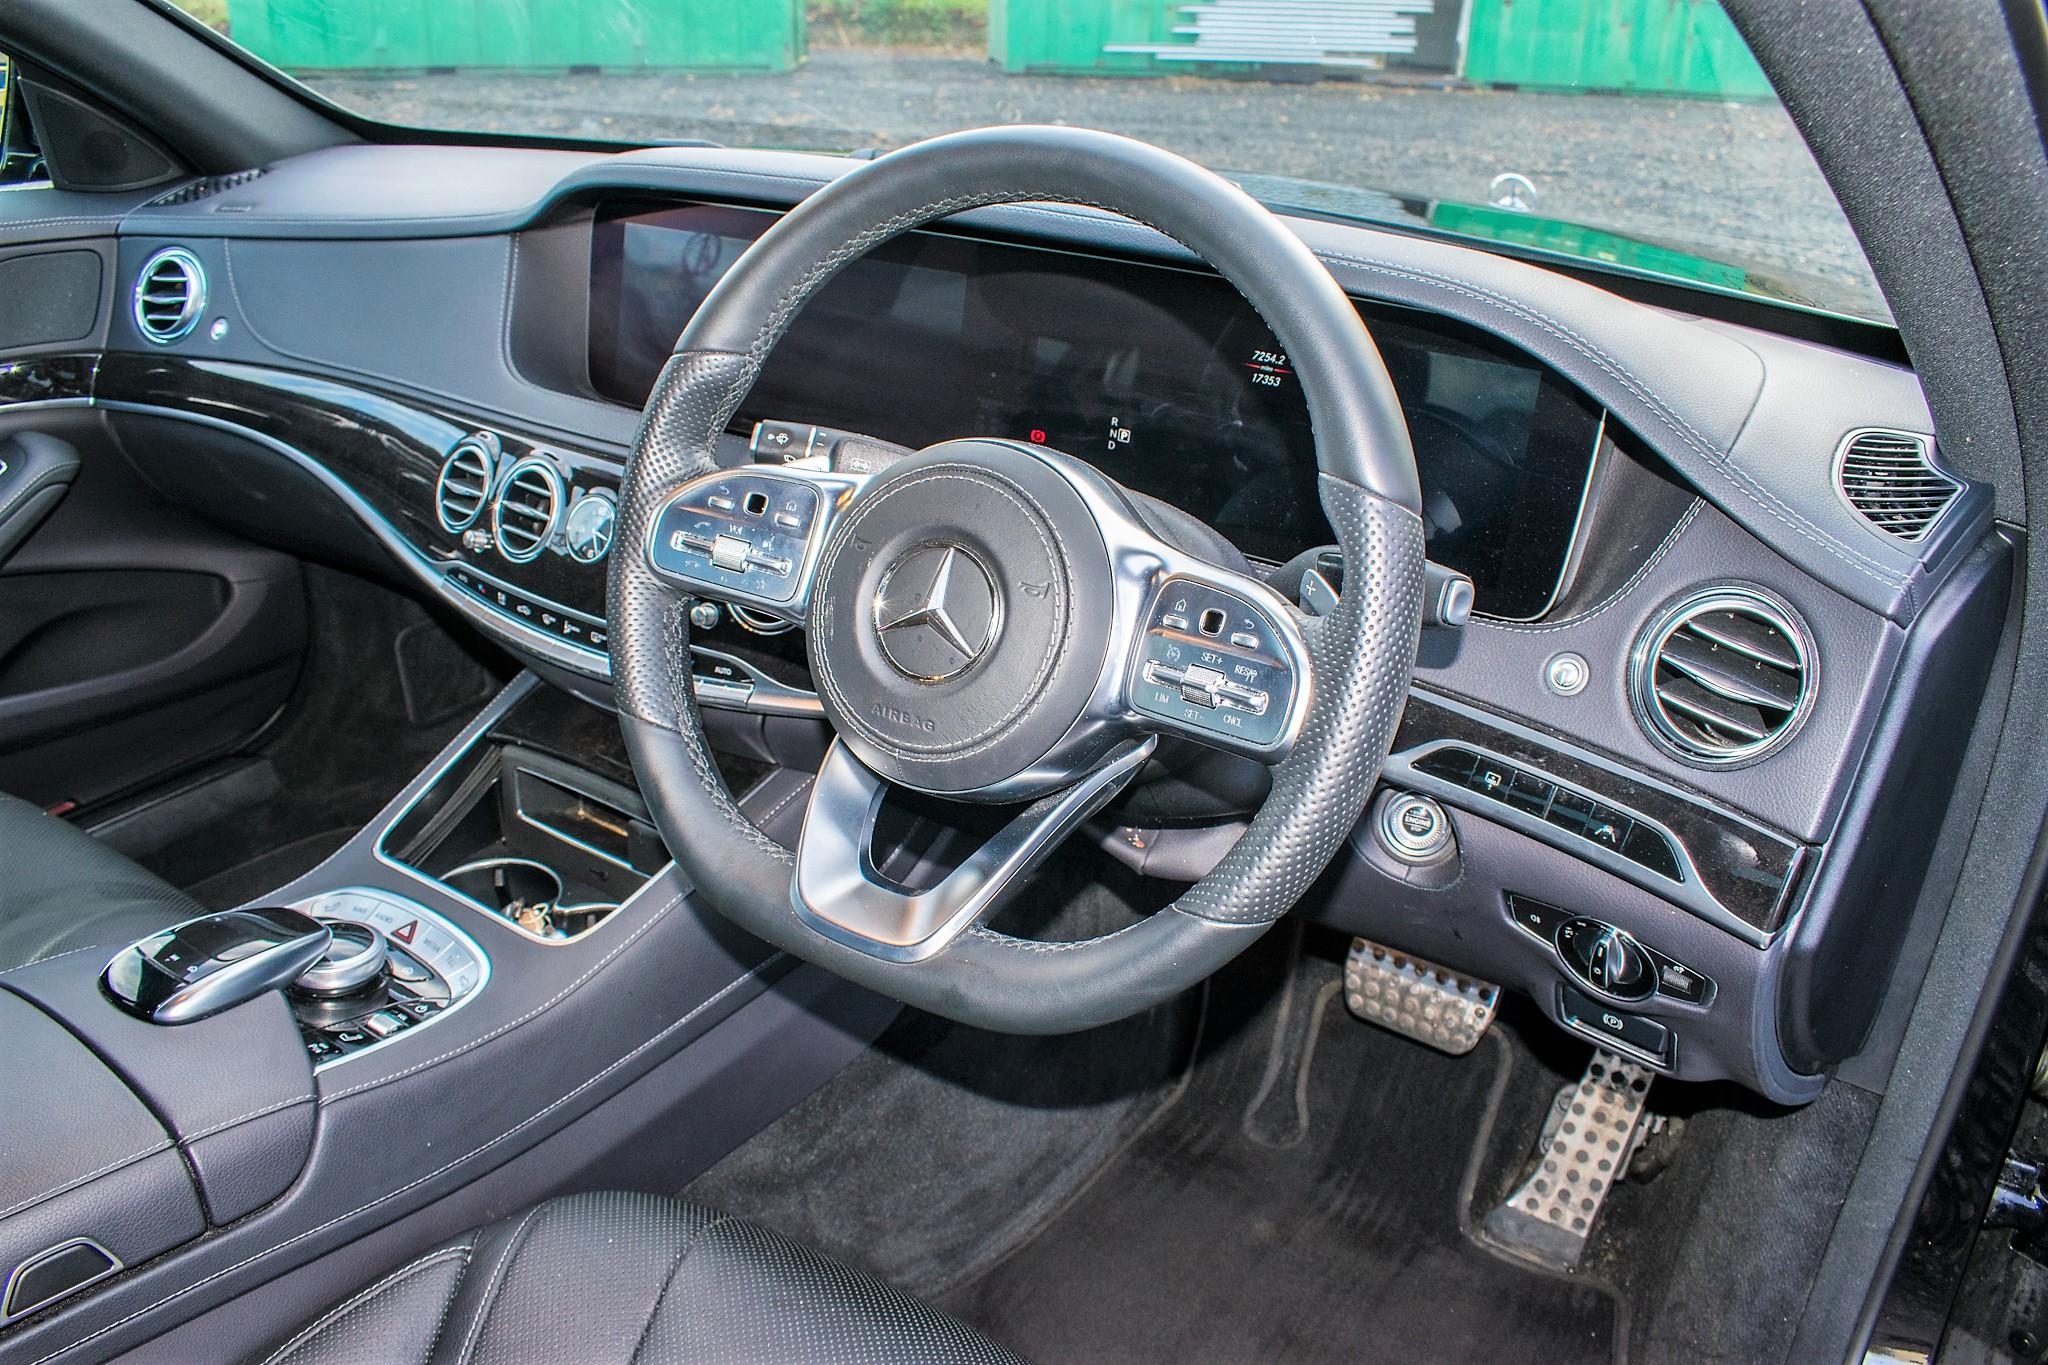 Mercedes Benz S450 L AMG Line Executive auto petrol 4 door saloon car Registration Number: FX68 - Image 21 of 33